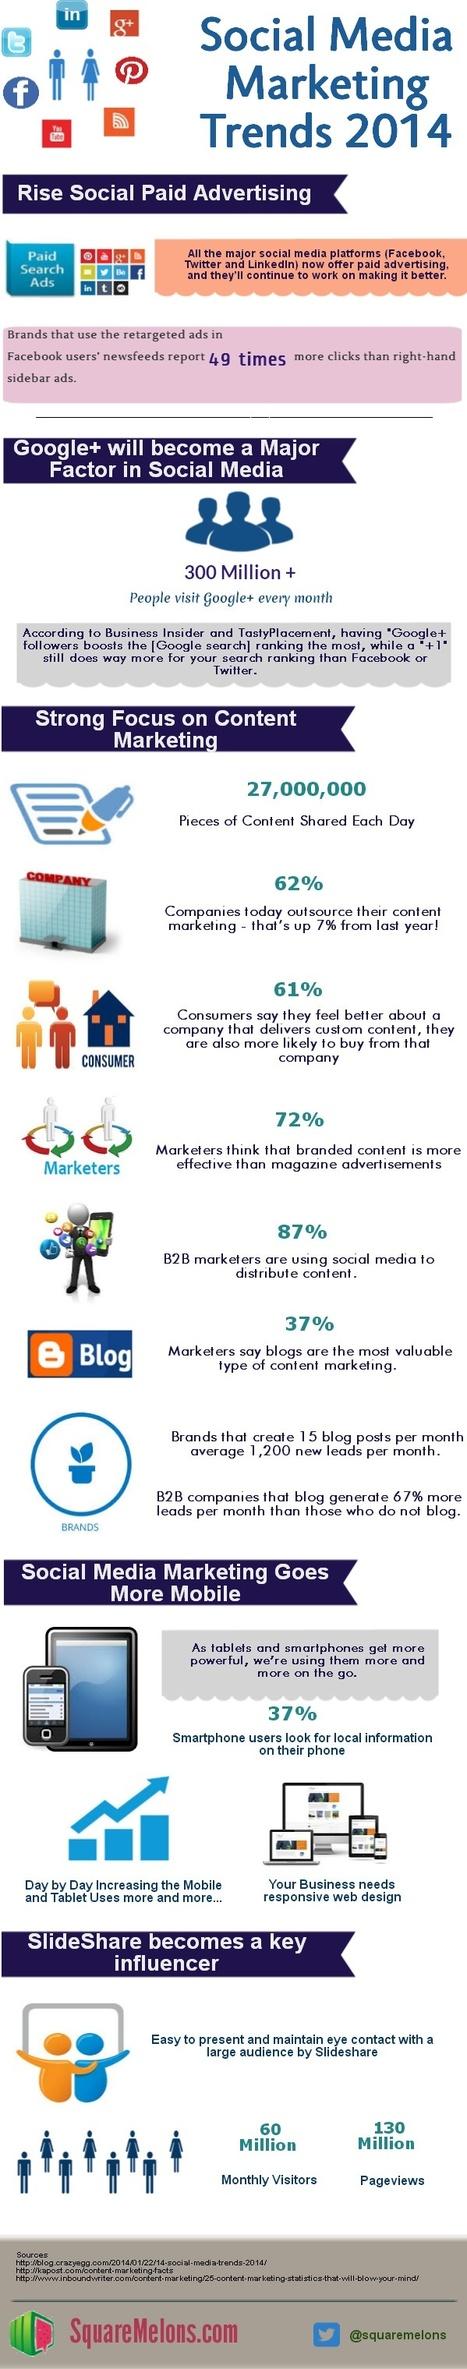 Social Media Marketing Trends 2014 | Visual.ly | Web Design, Web Development , SEO, Mobile App Topics | Scoop.it